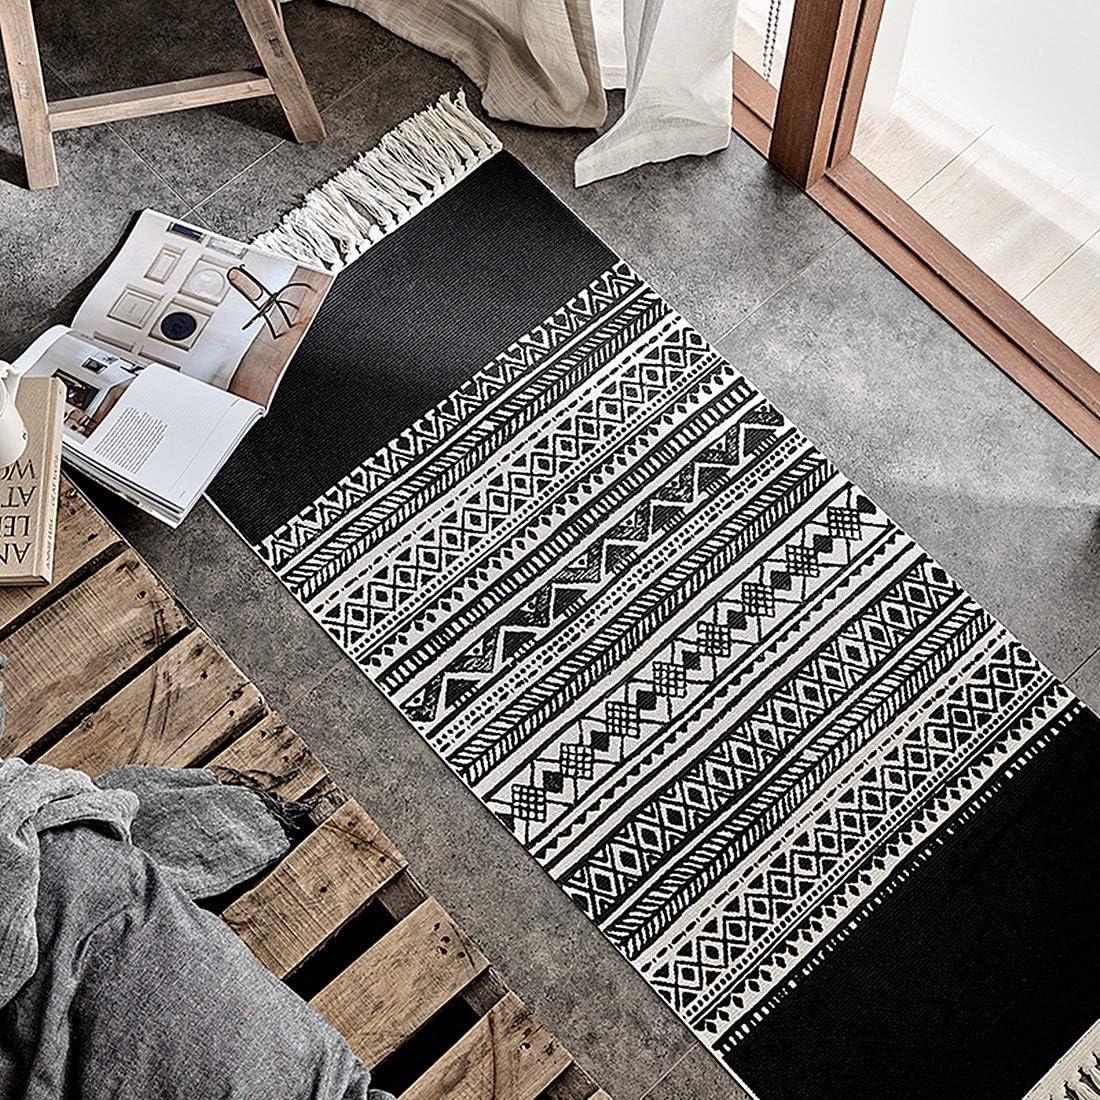 "Ukeler Black&White Laundry Room Rug Cotton Tassel Hand Woven Braided Doormat for Bathroom Porch Bedroom Home Décor Rug, 23.6"" x 51.2"""